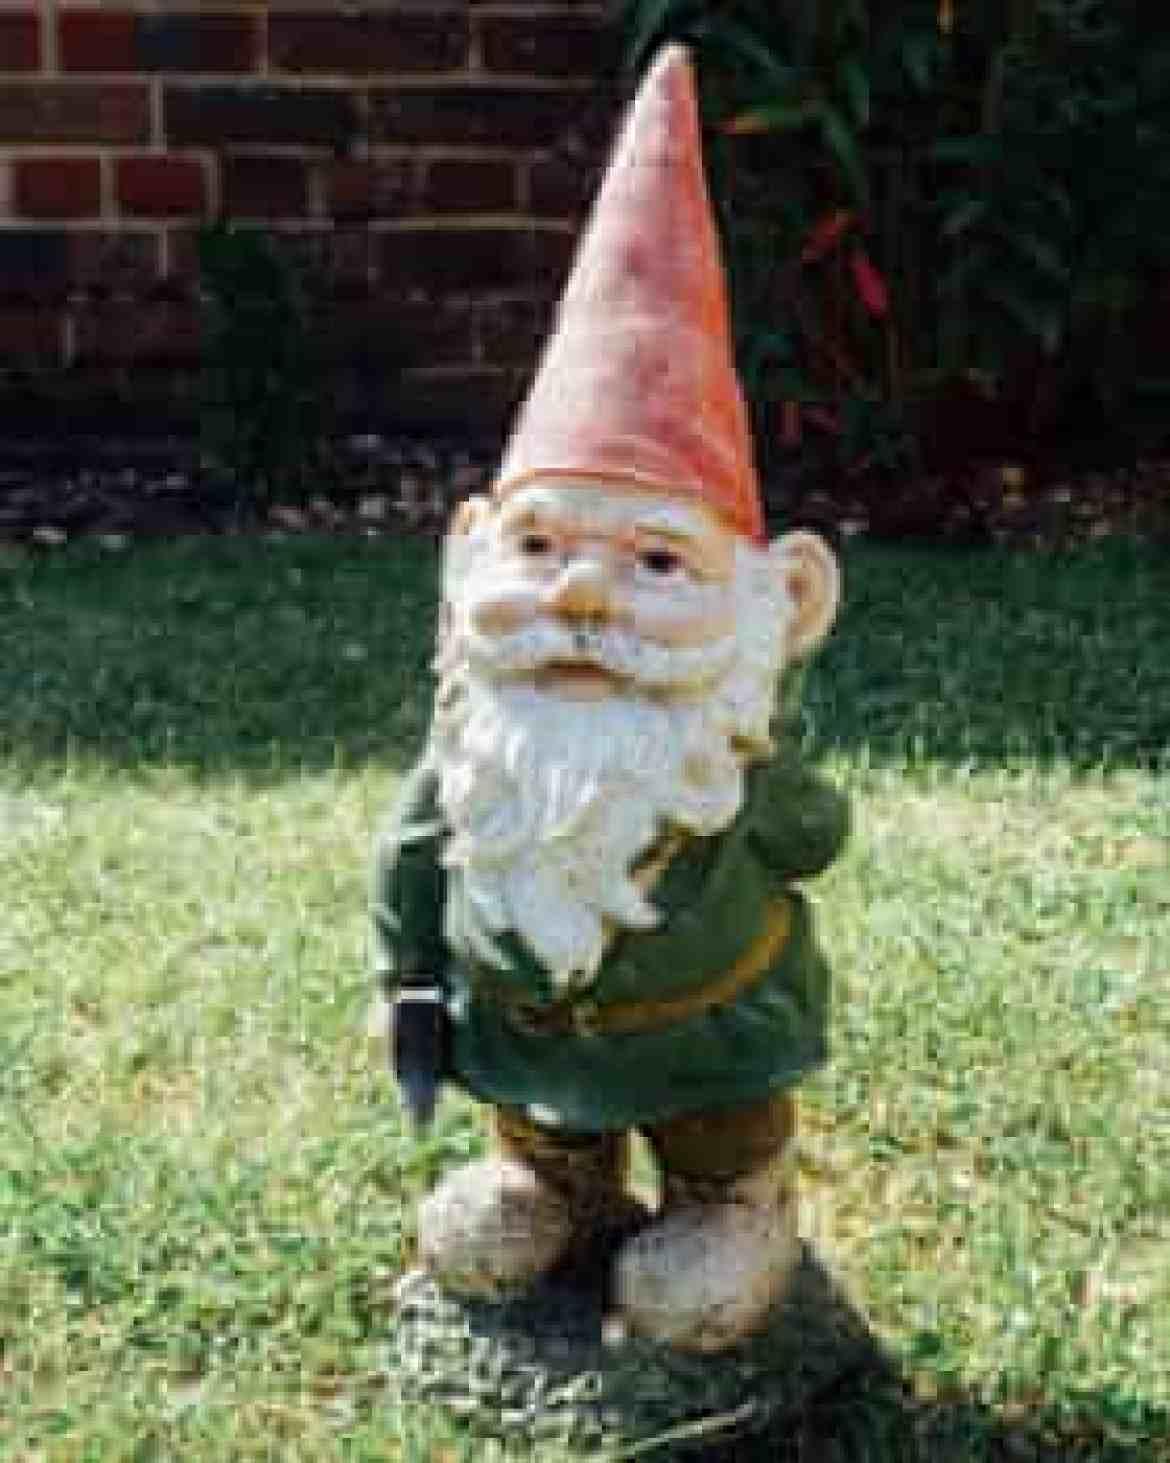 A gnome in a back garden.